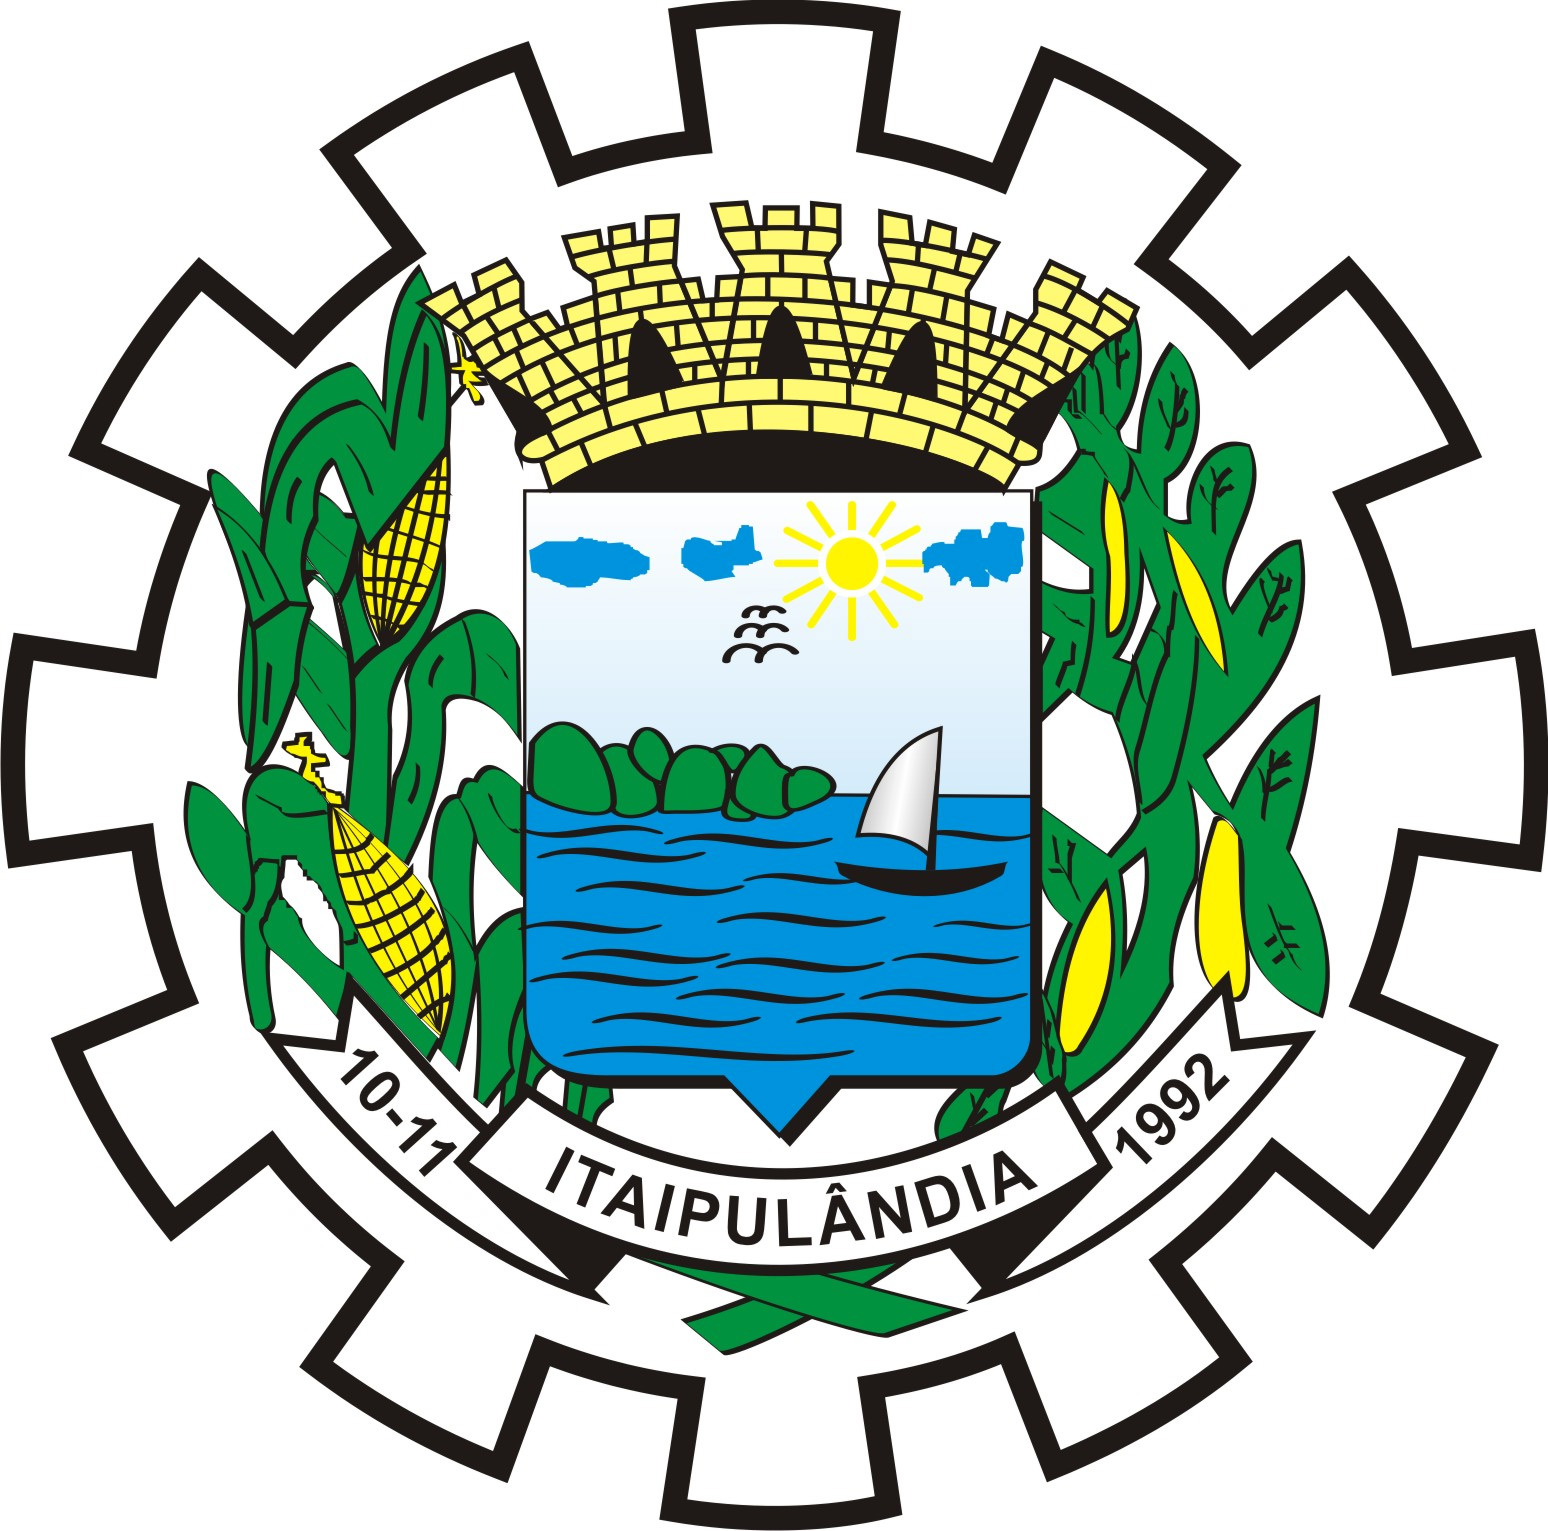 CÃ'MARA MUNICIPAL DE ITAIPULÃ'NDIA